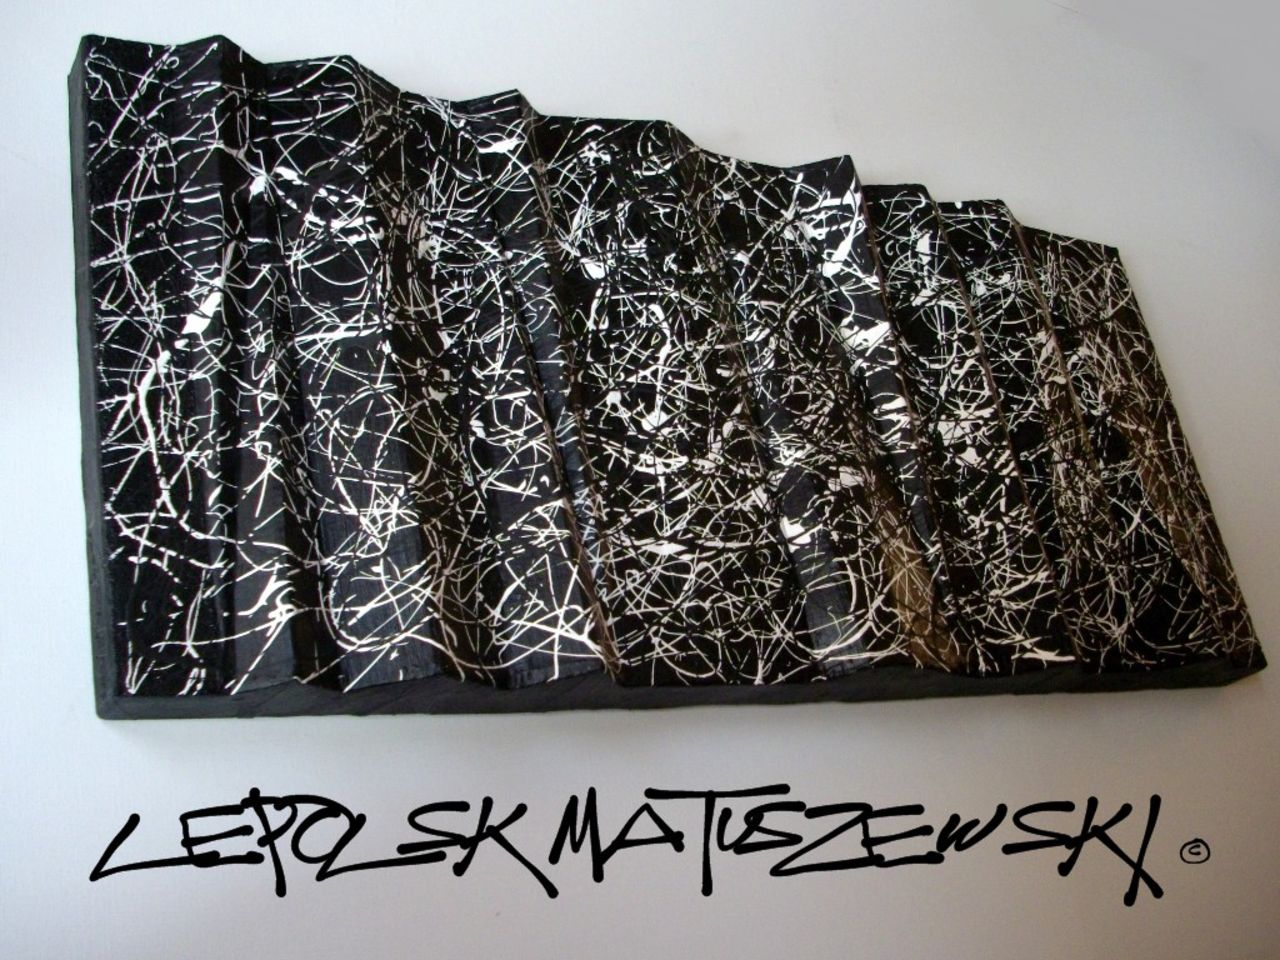 MISTER K  (Lepolsk Matuszewski) PROTOTYPE 104 expressionnisme abstrait